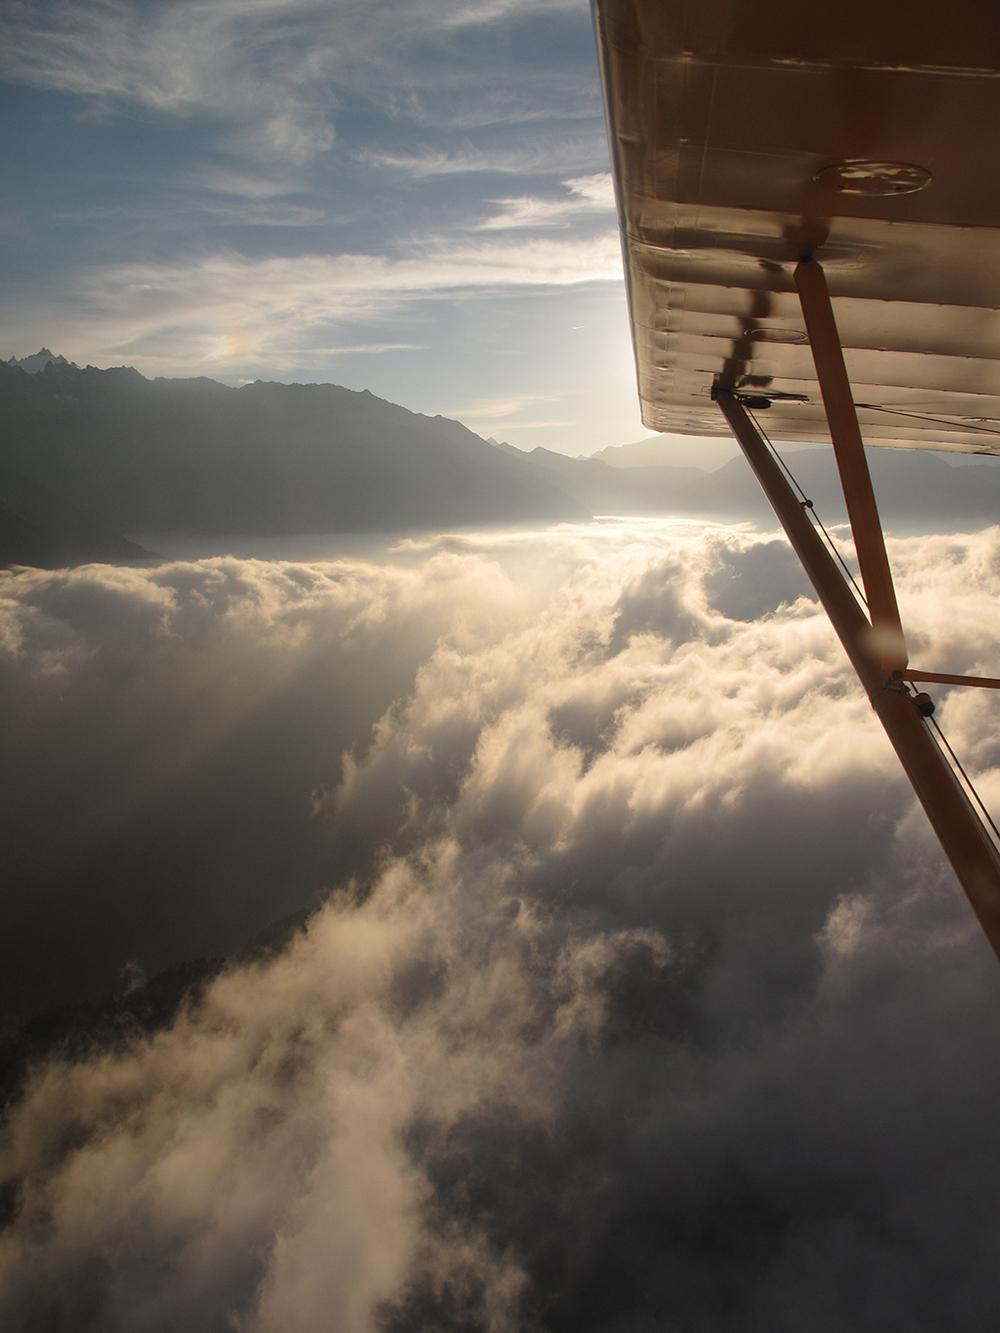 Remy_Ast_avion_chablais_villarsax.jpg